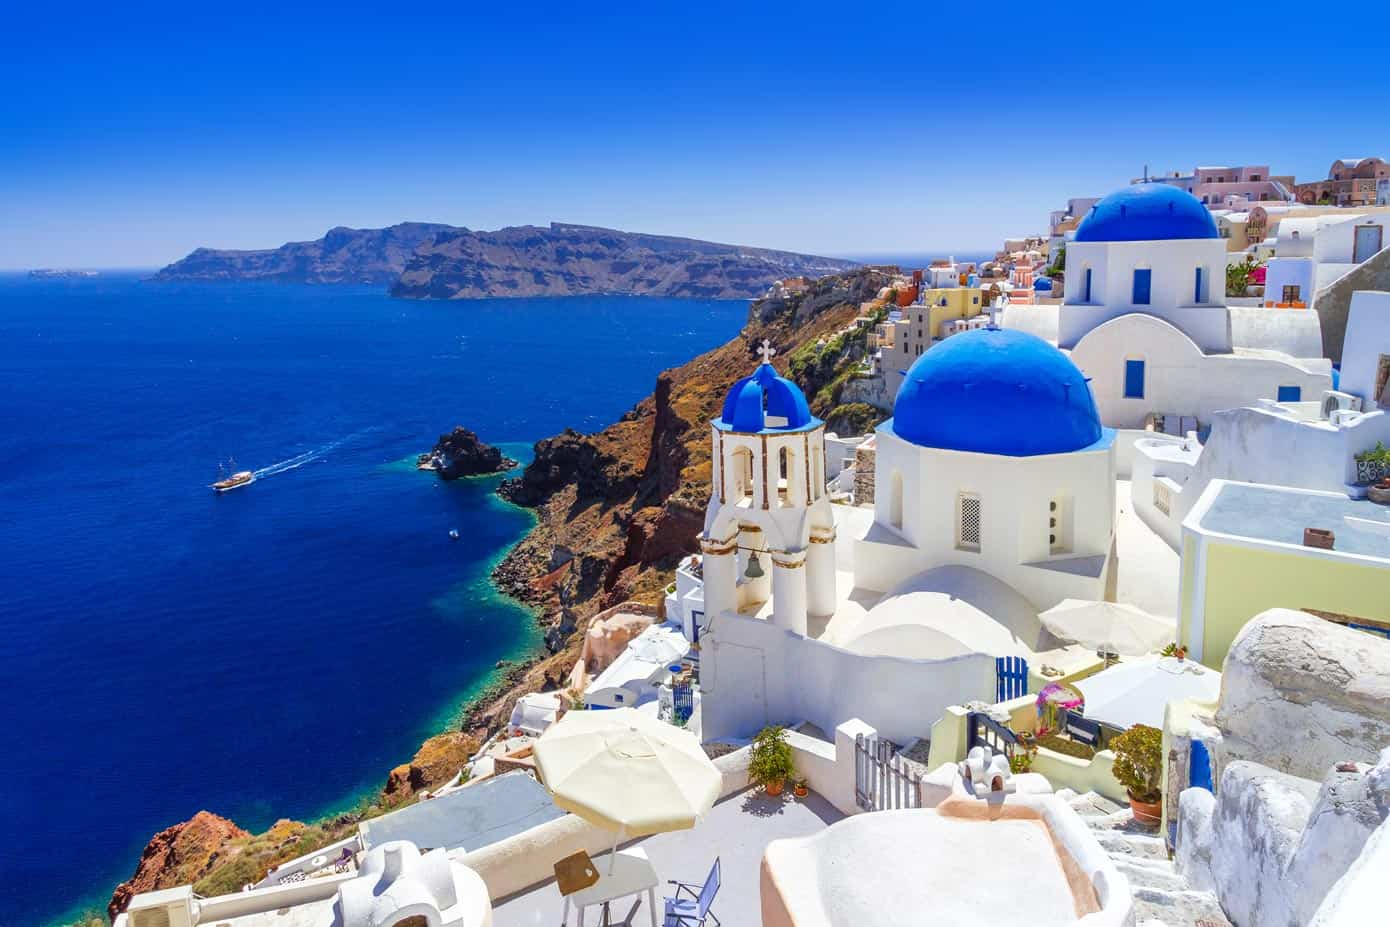 Beautiful blue and white Oia town on Santorini Island, Greece.